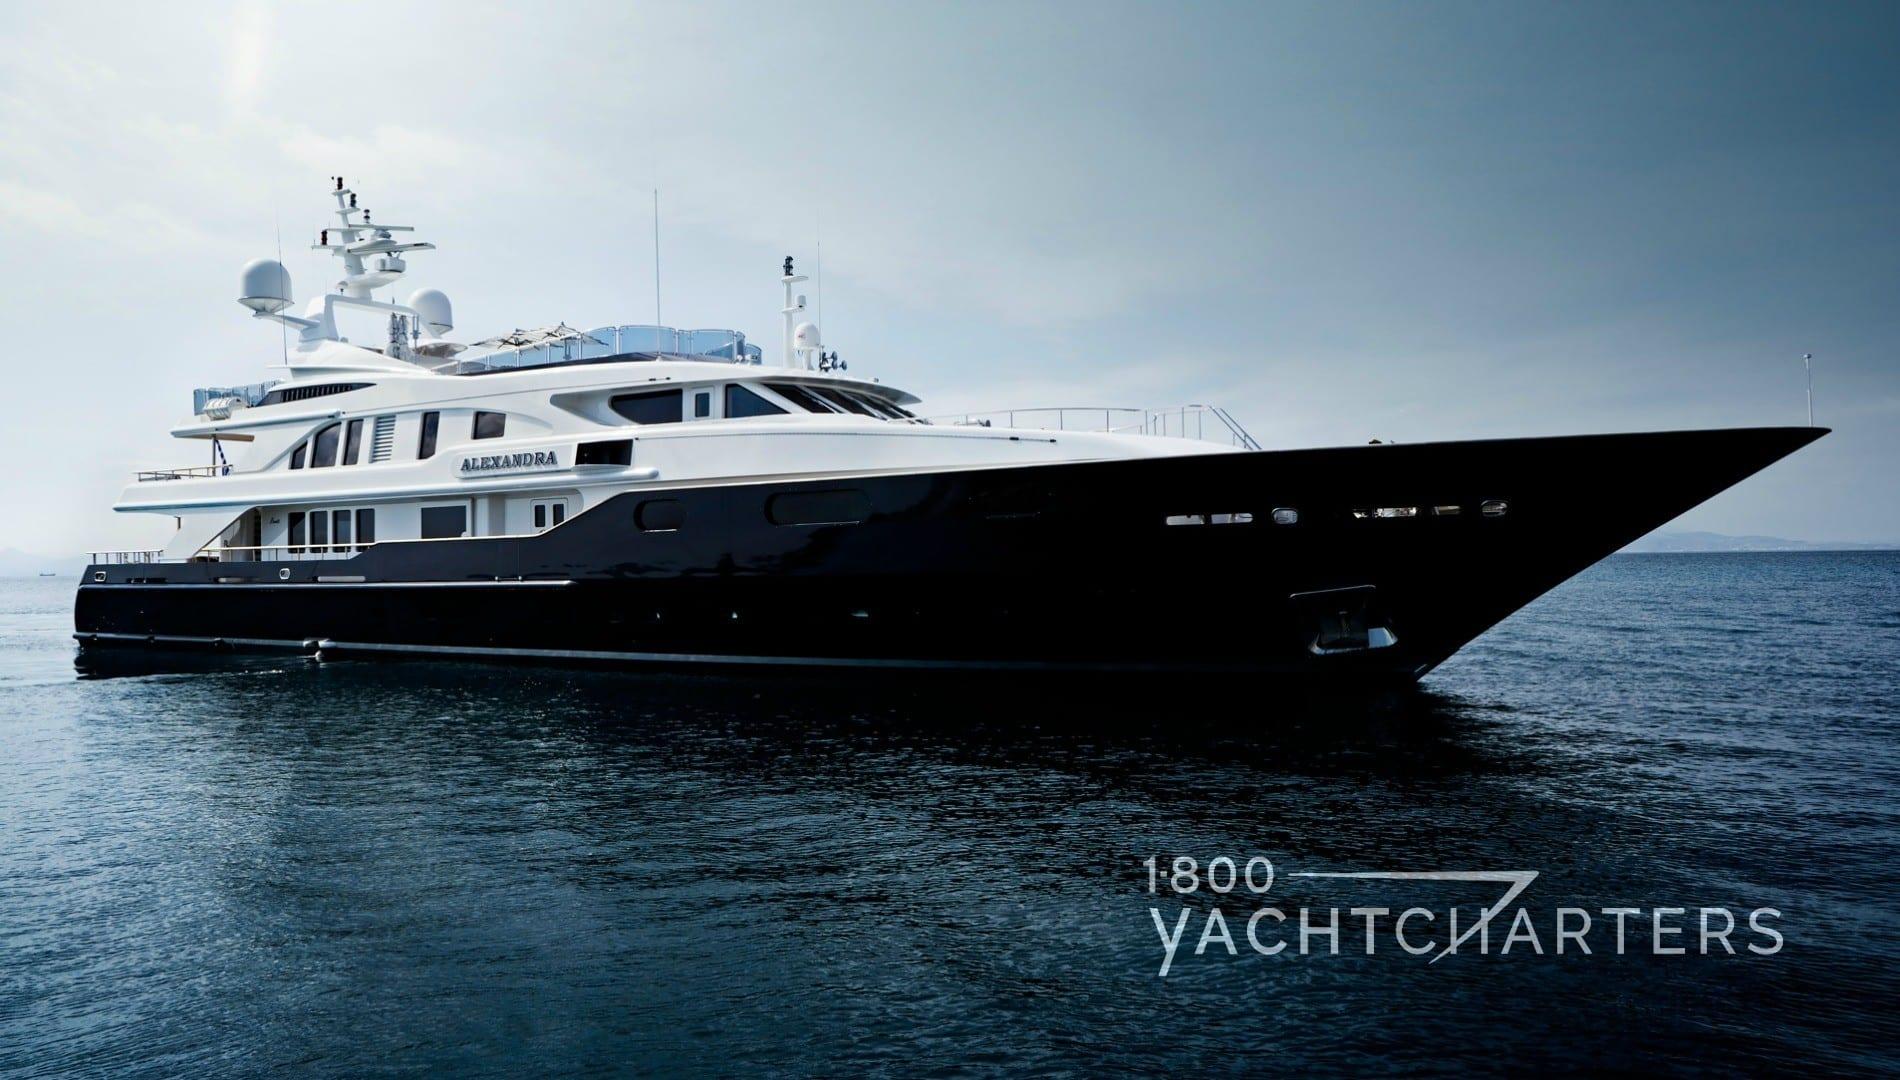 ALEXANDRA yacht charter Benetti superyacht